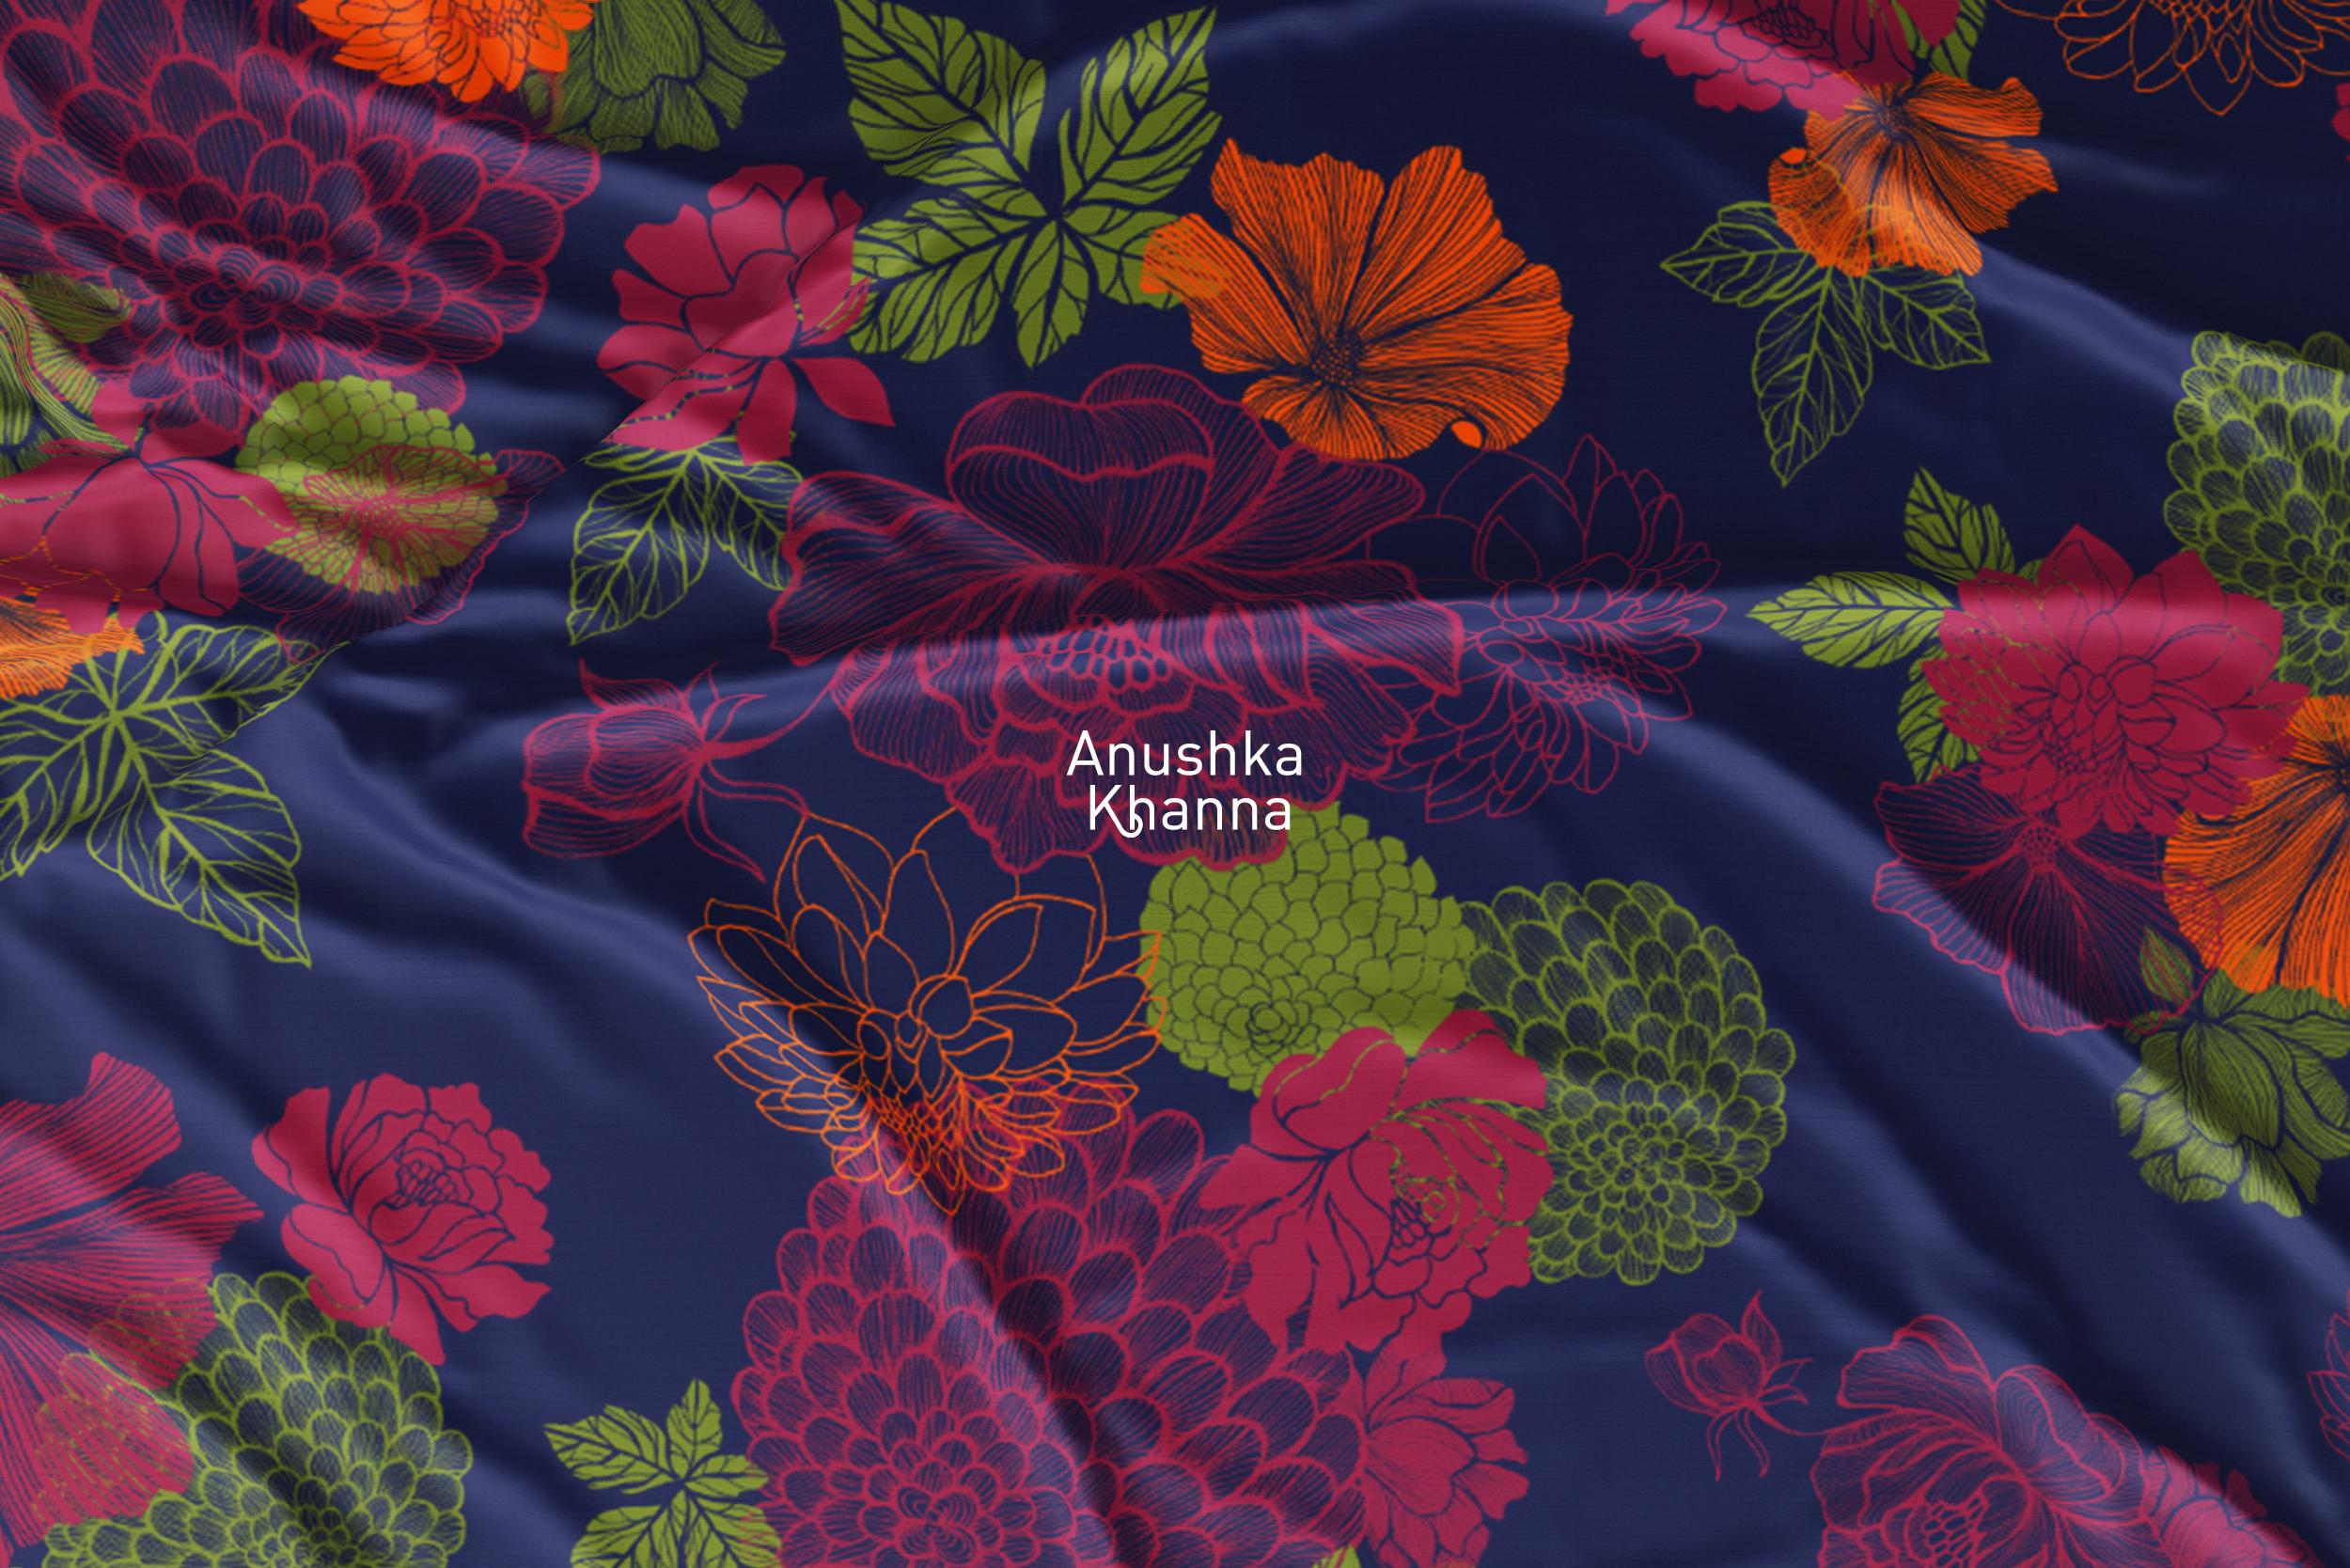 Anushka Khanna template.jpg